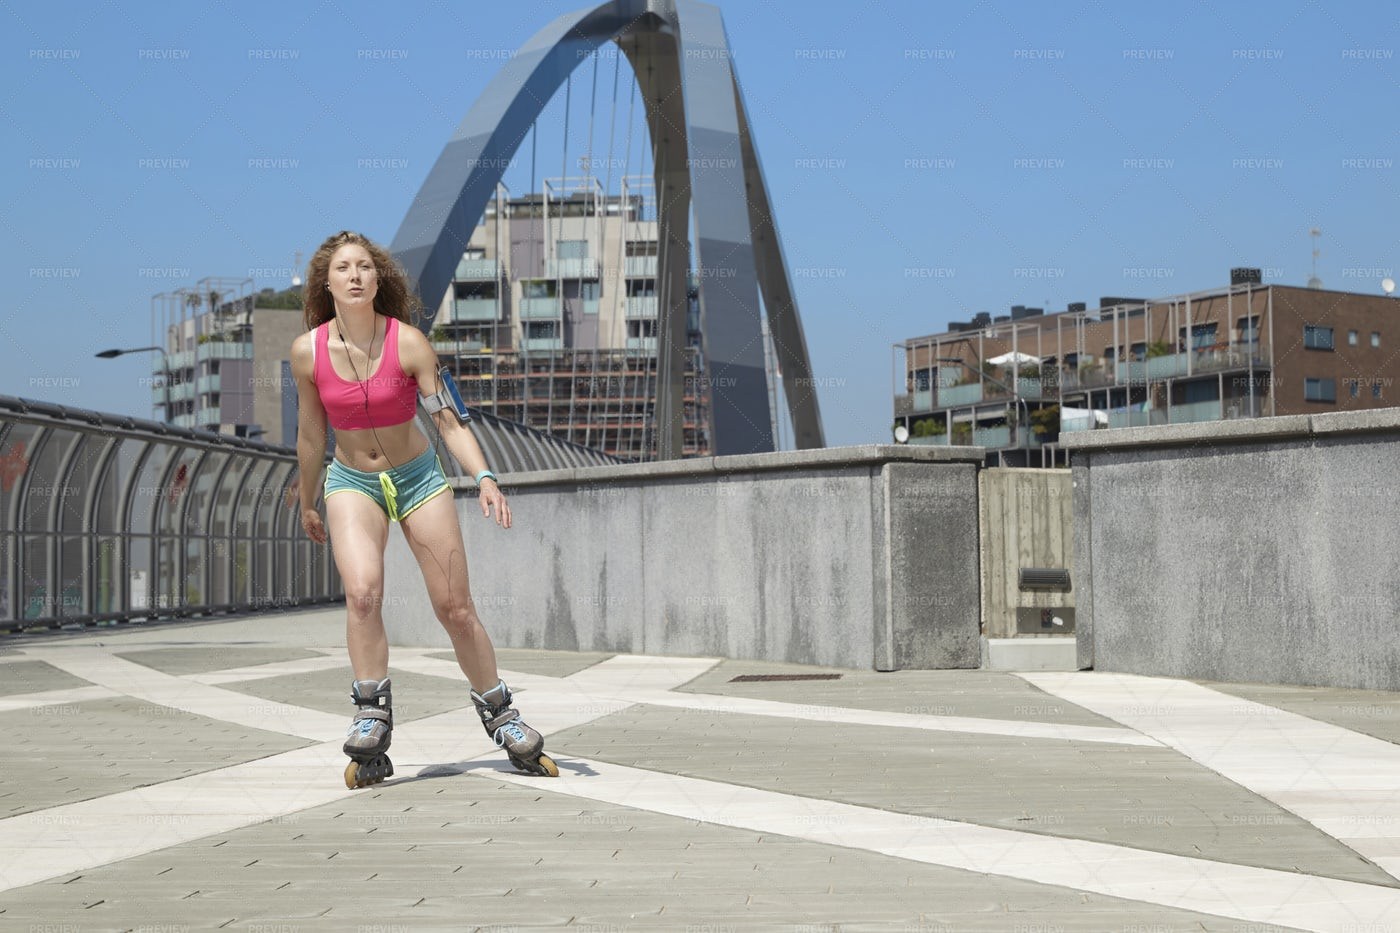 City Skating: Stock Photos